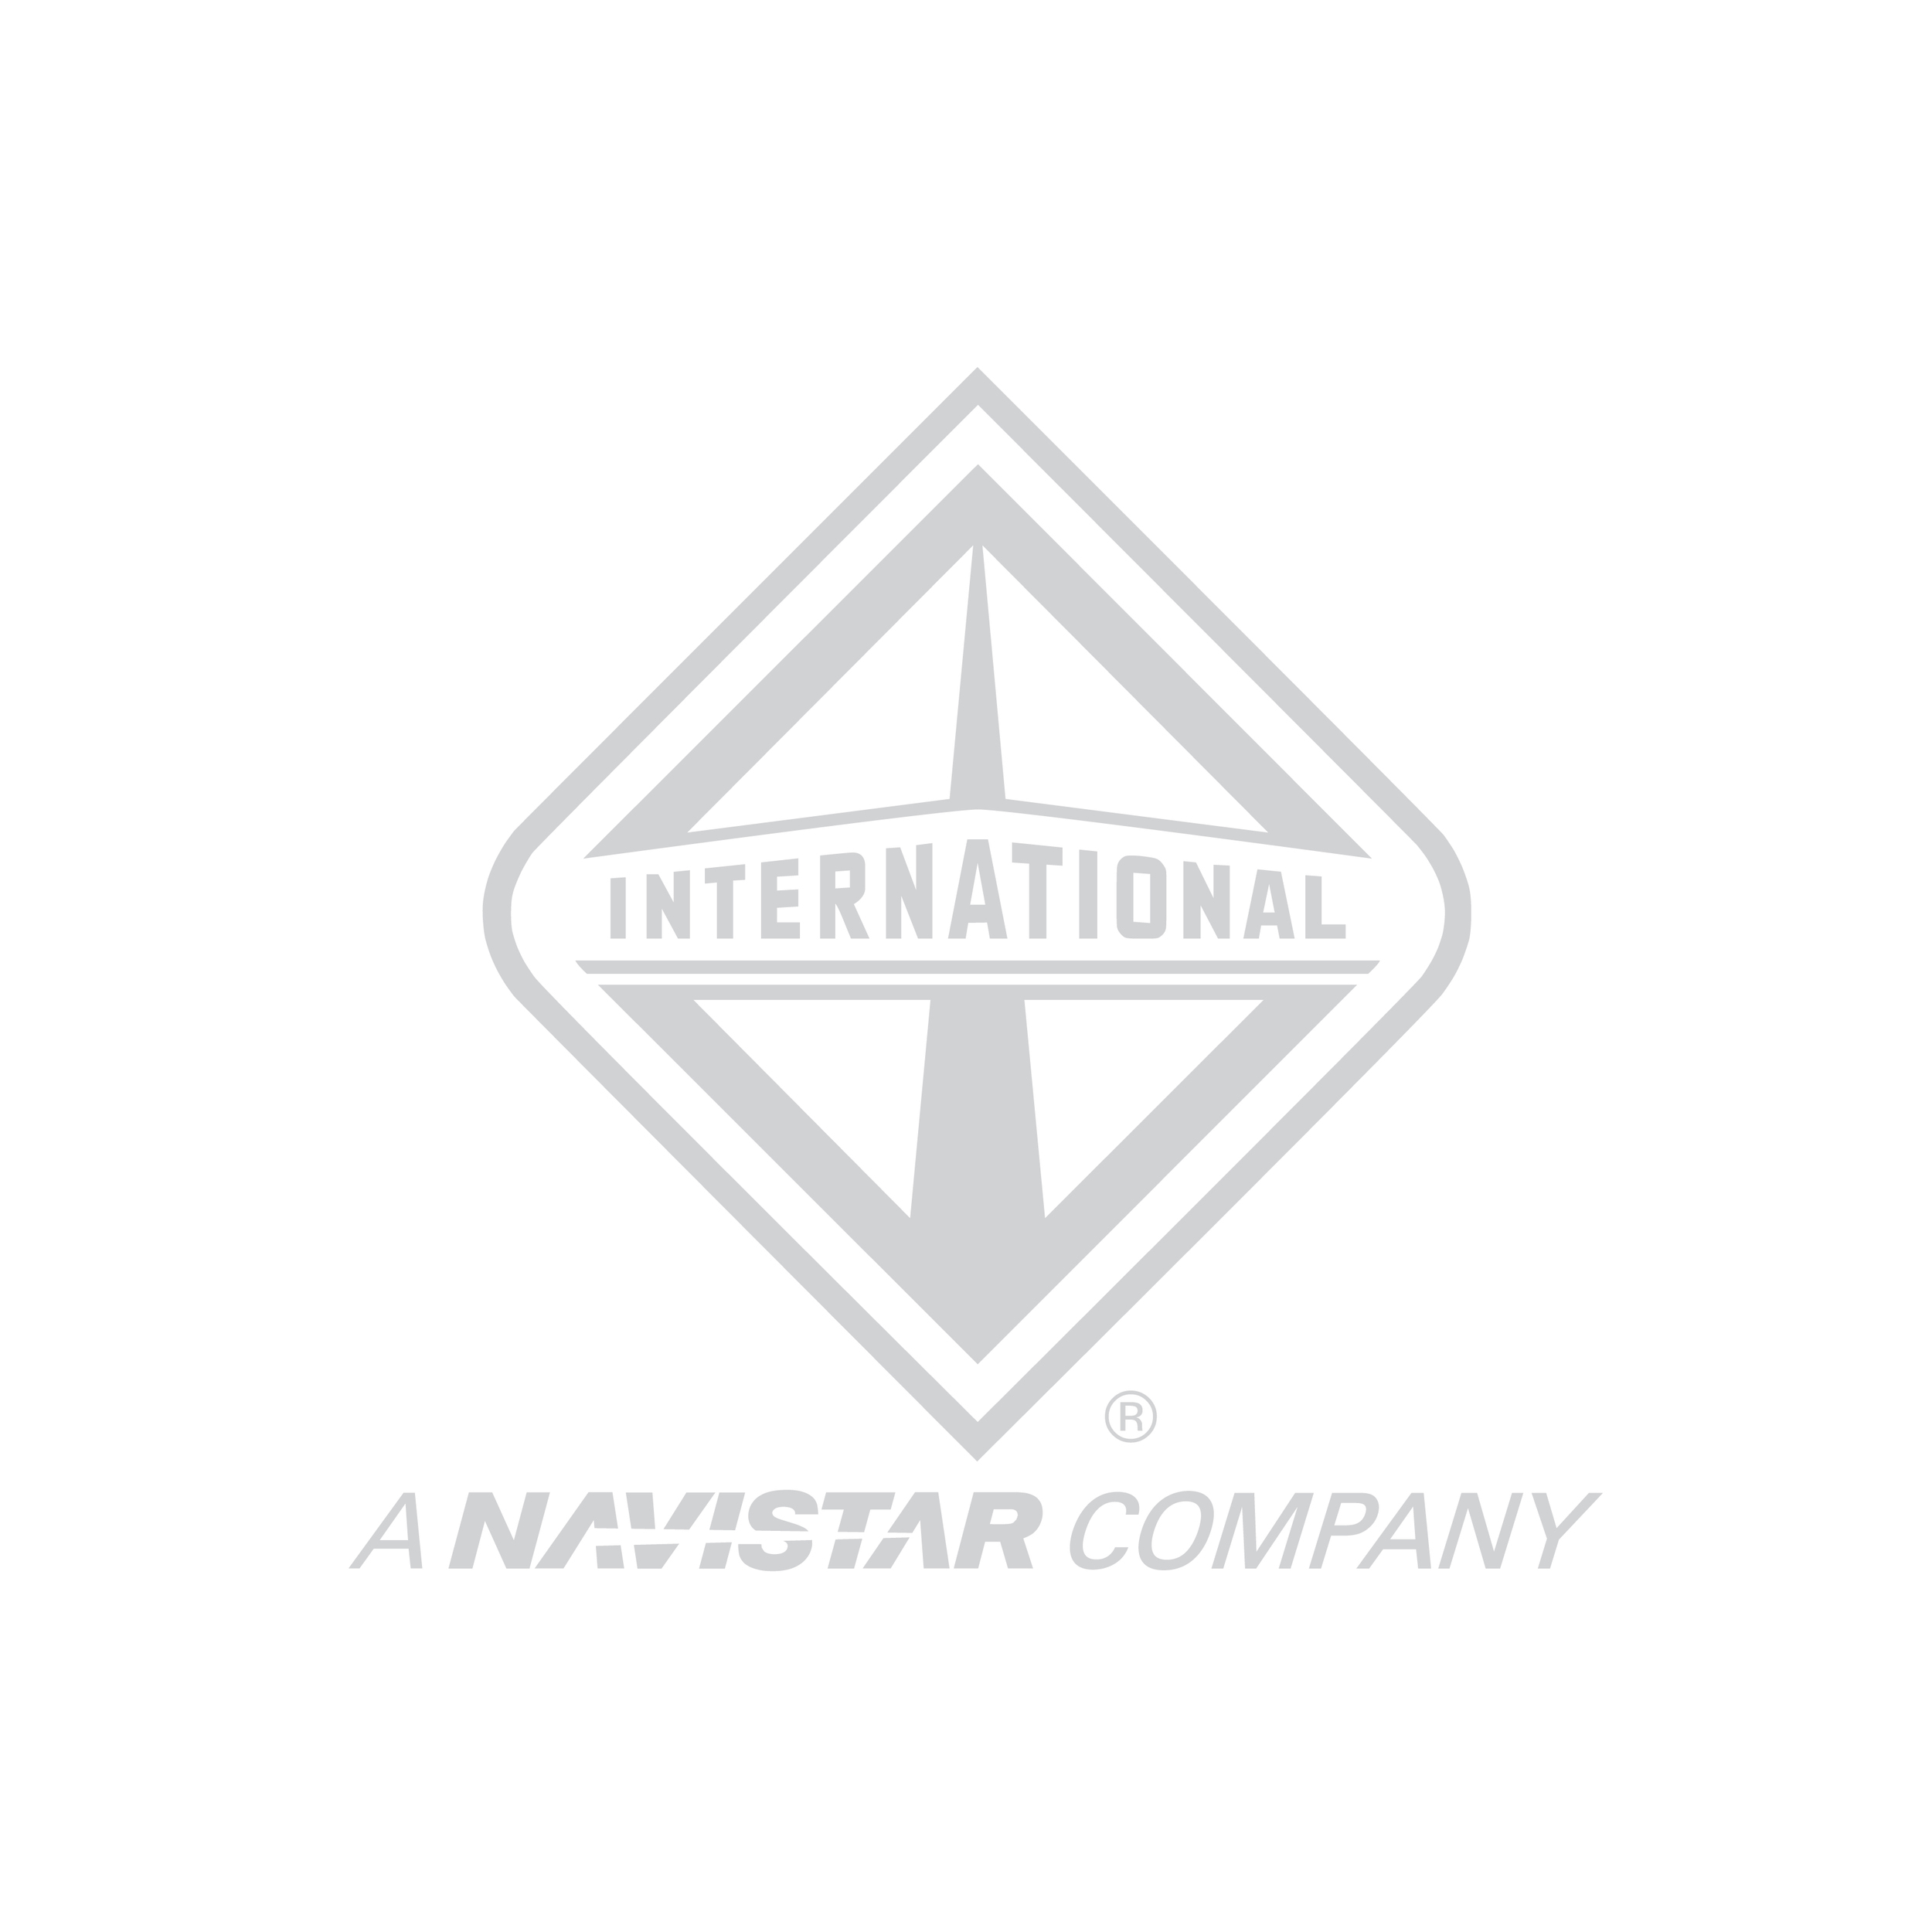 logos-15.jpg